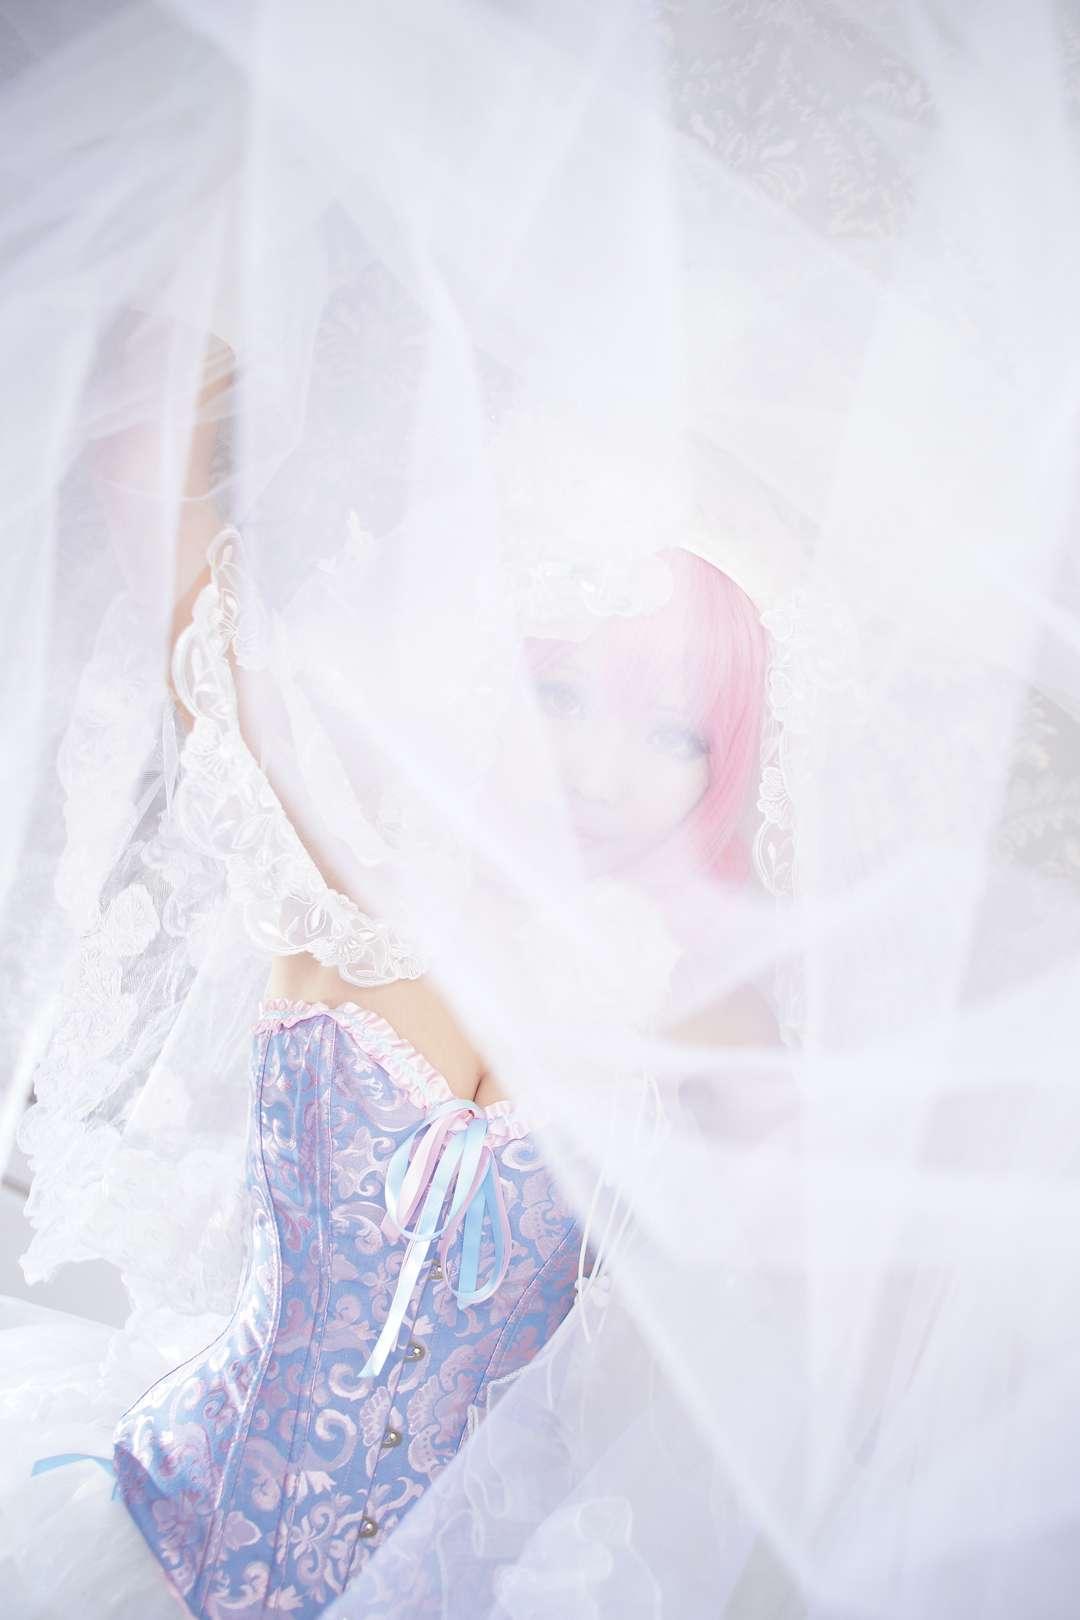 【cos图】🌟COS系列🌟【西行寺幽幽子】